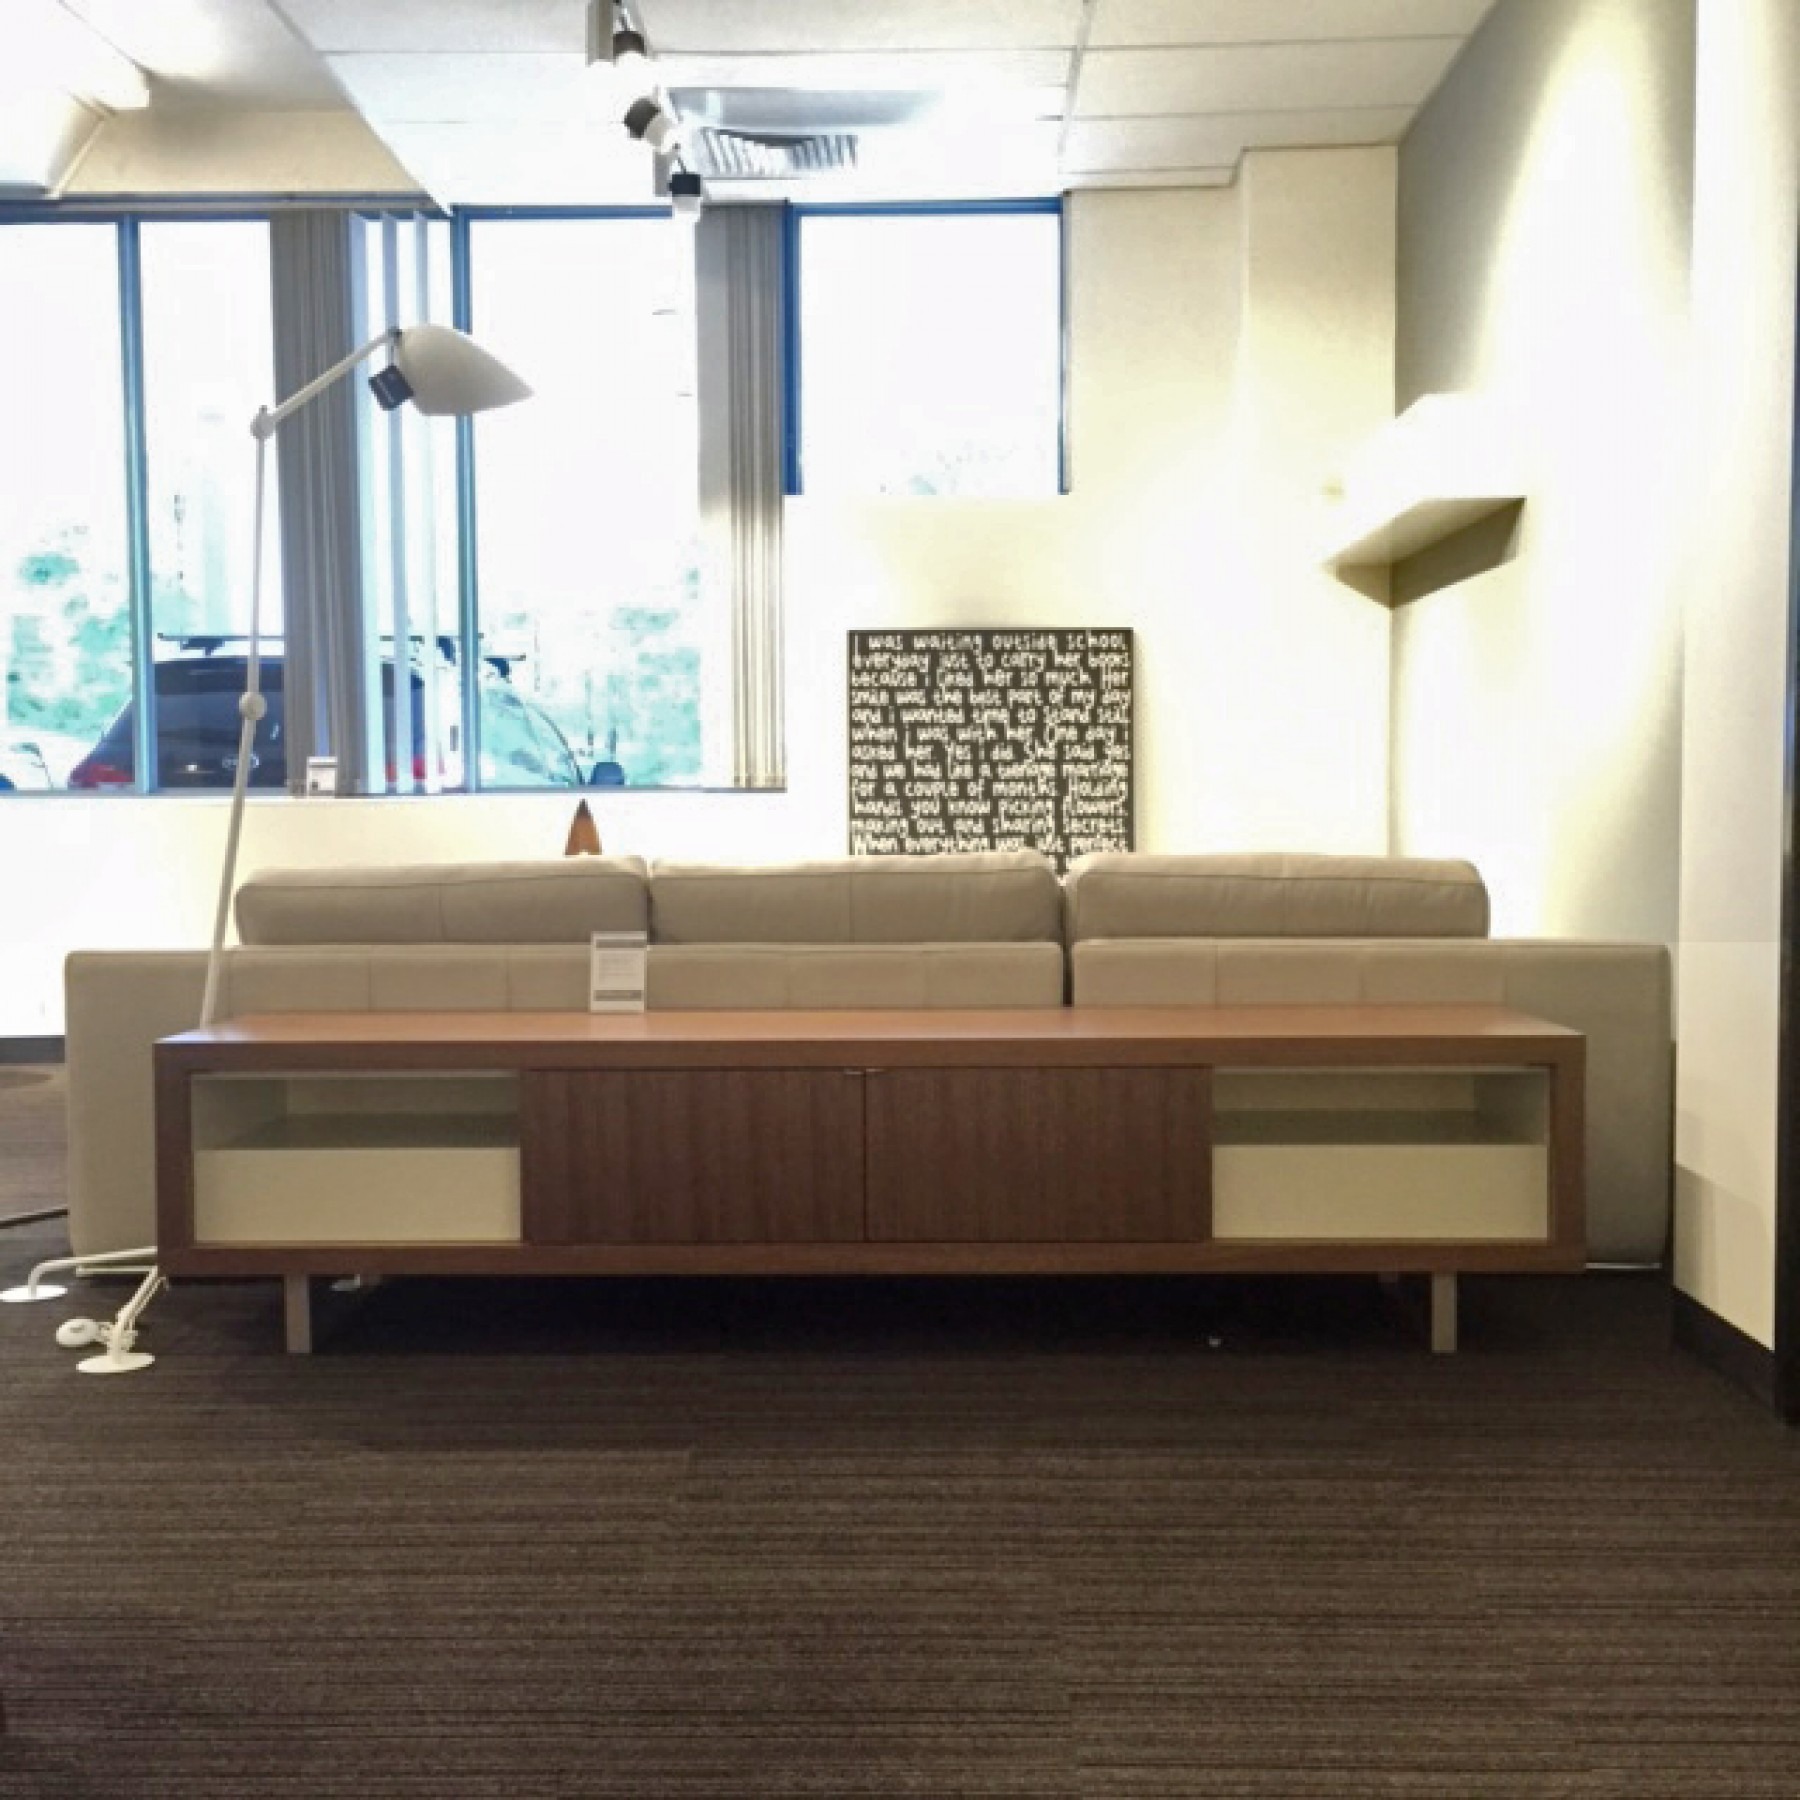 American Furniture Warehouse Bar Stools